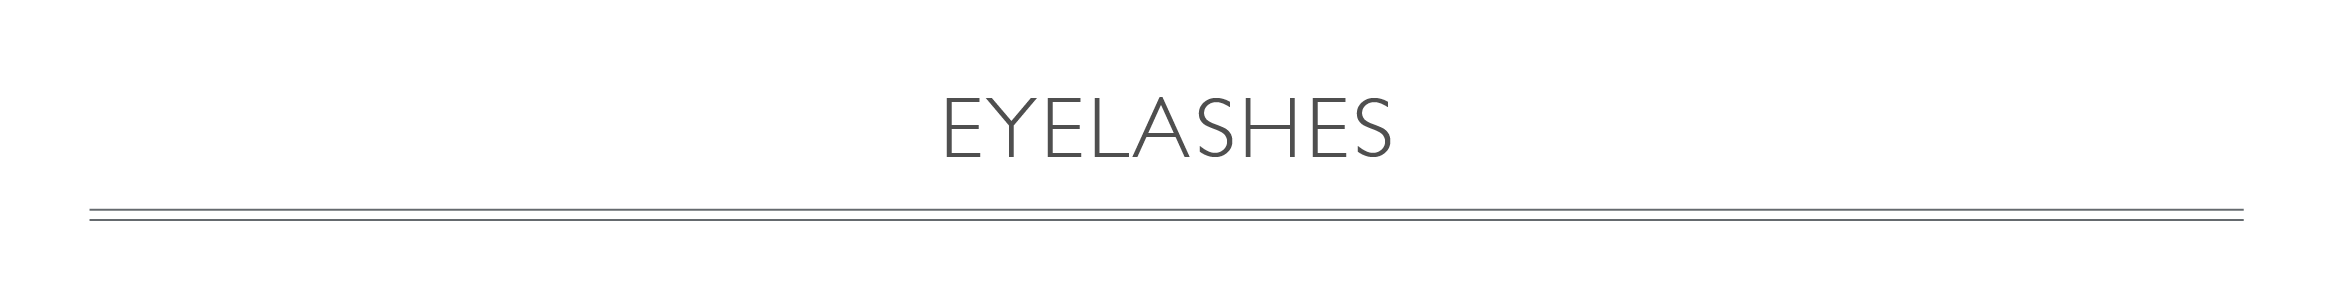 spa_vs_banner_eyelashes.png